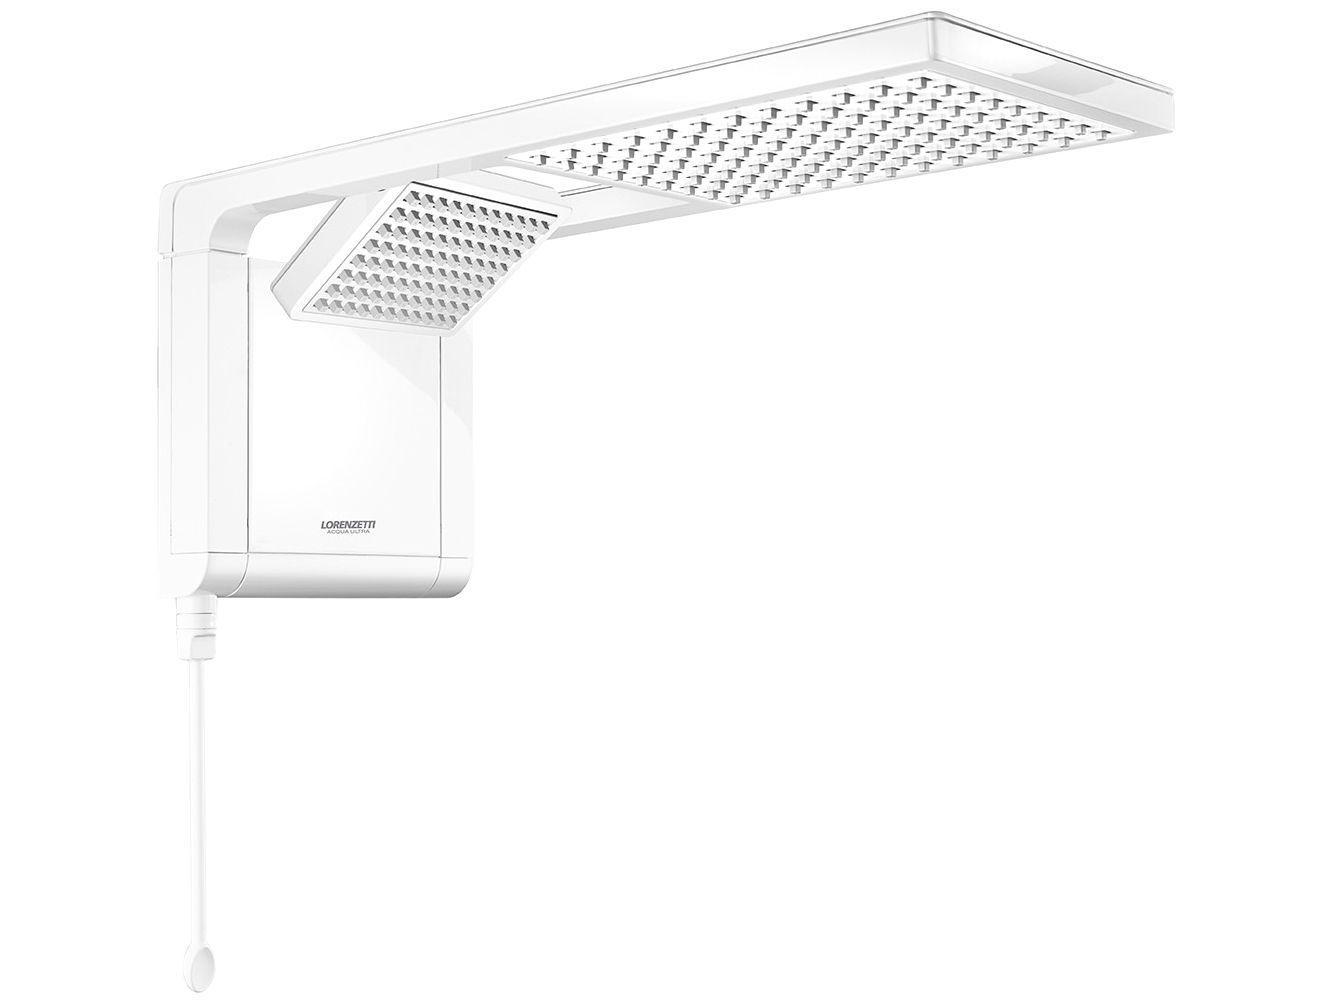 Chuveiro Eletrônico Lorenzetti Ultra Aqua Duo - 6800W Branco Temperatura Gradual